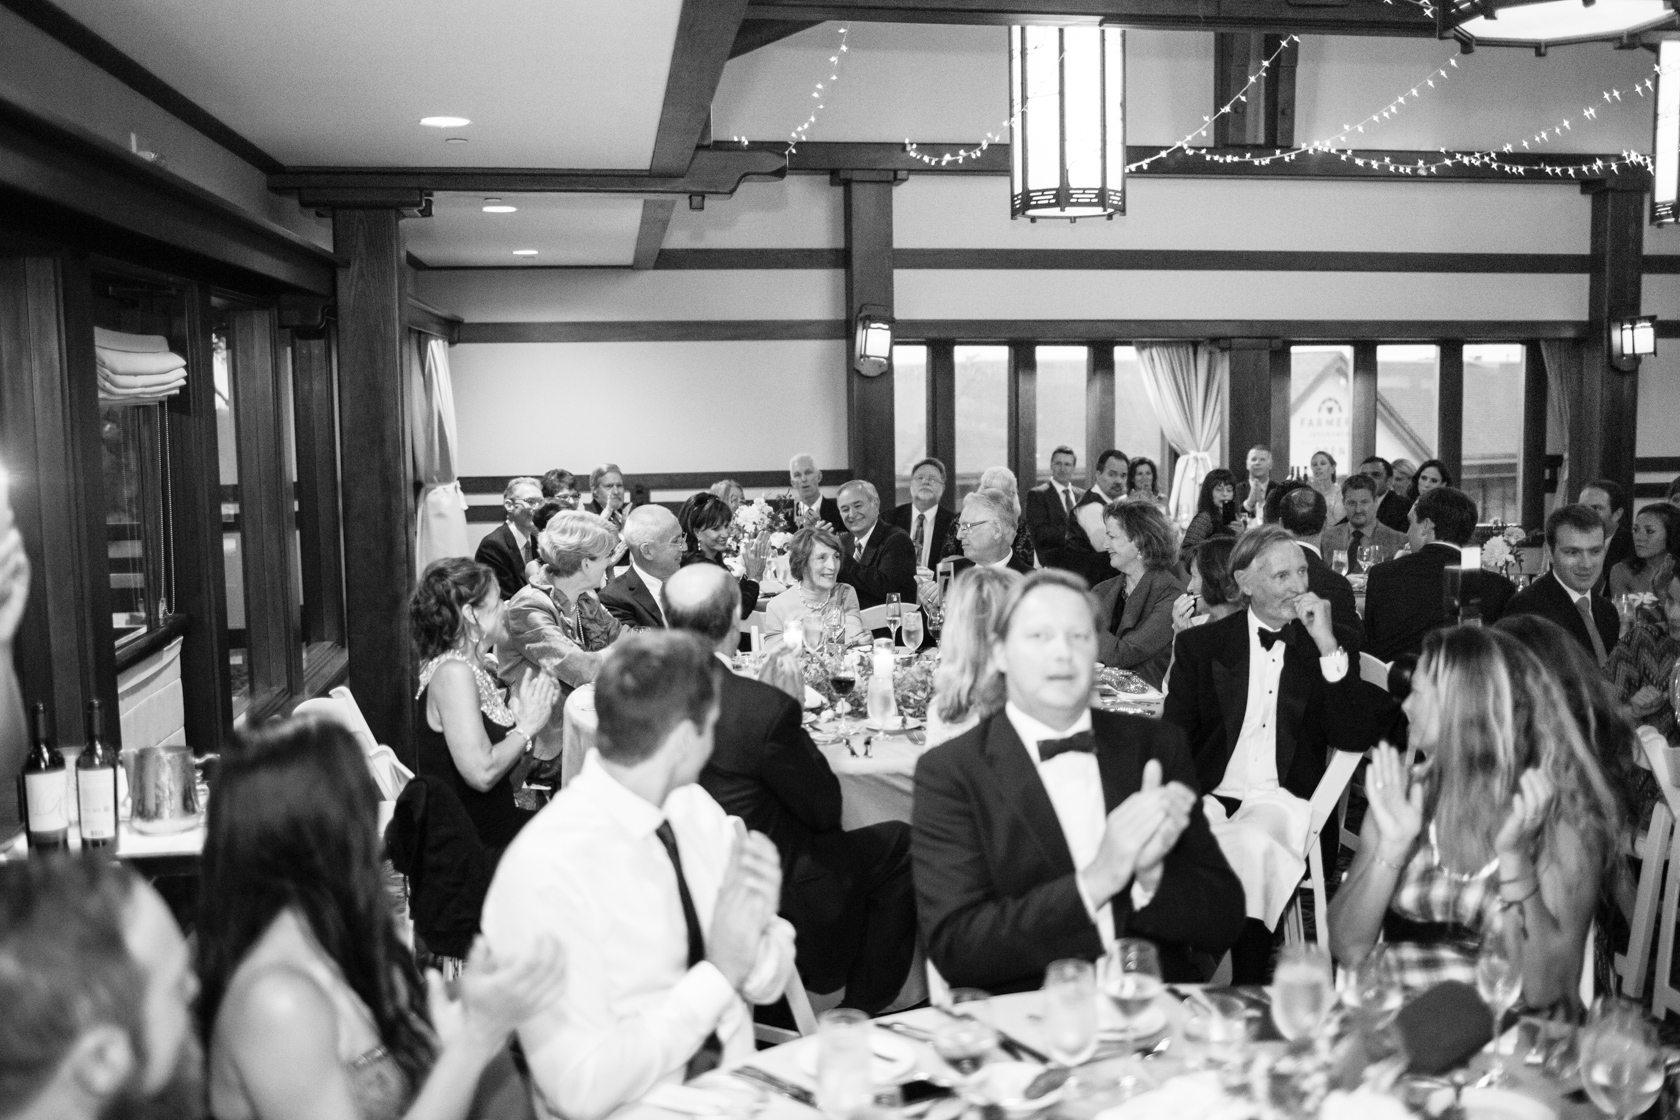 The_Lodge_at_Torrey_Pines_Wedding_096.jpg